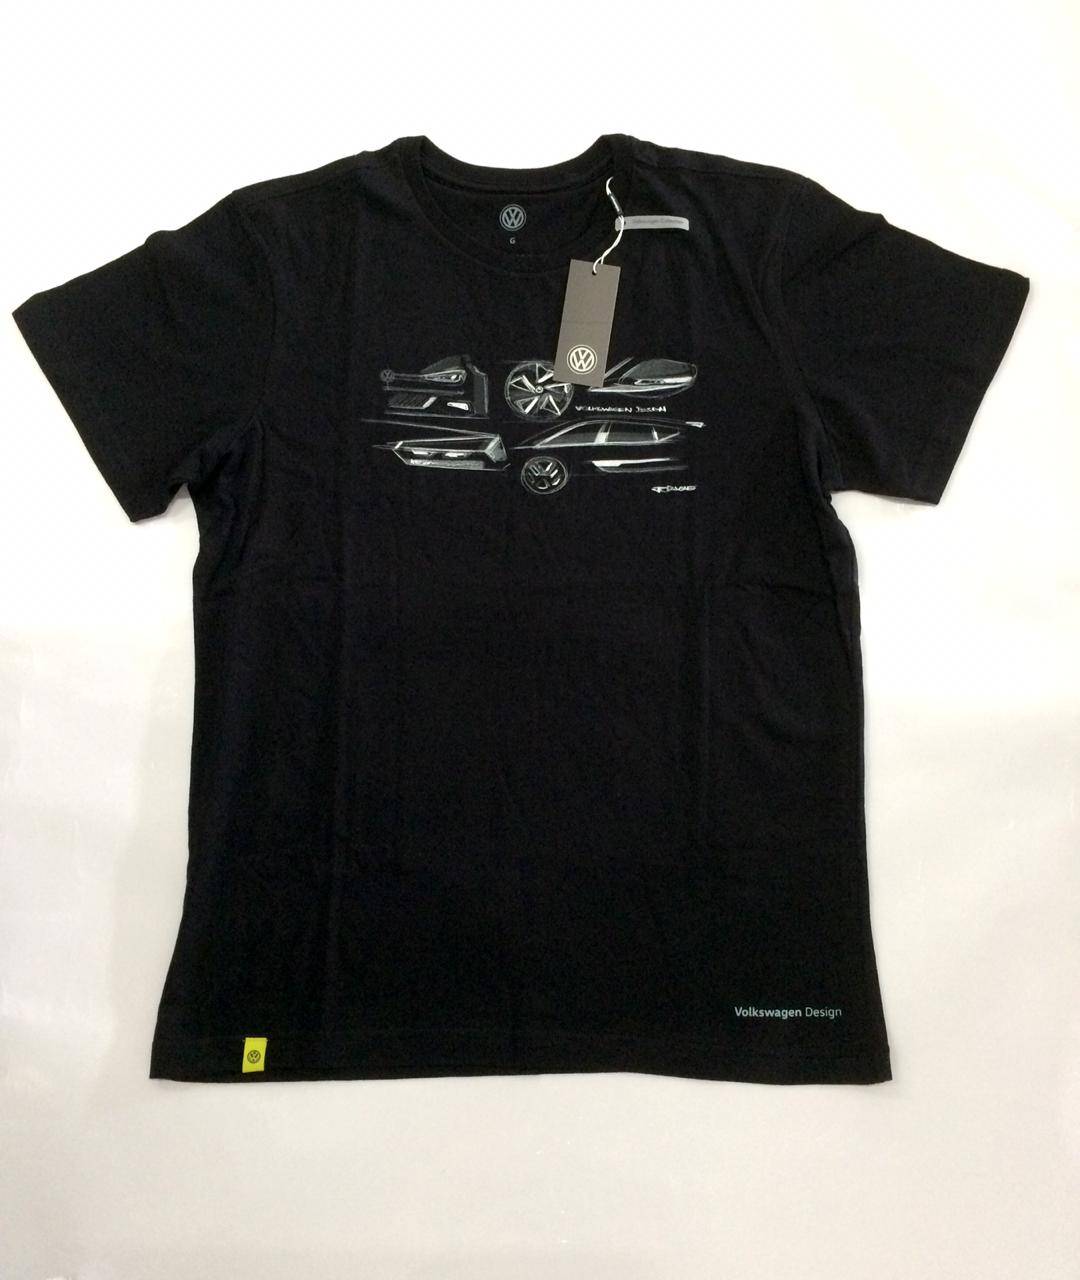 Camiseta Original Volkswagen Black Tee GTI Masculina Tam. G